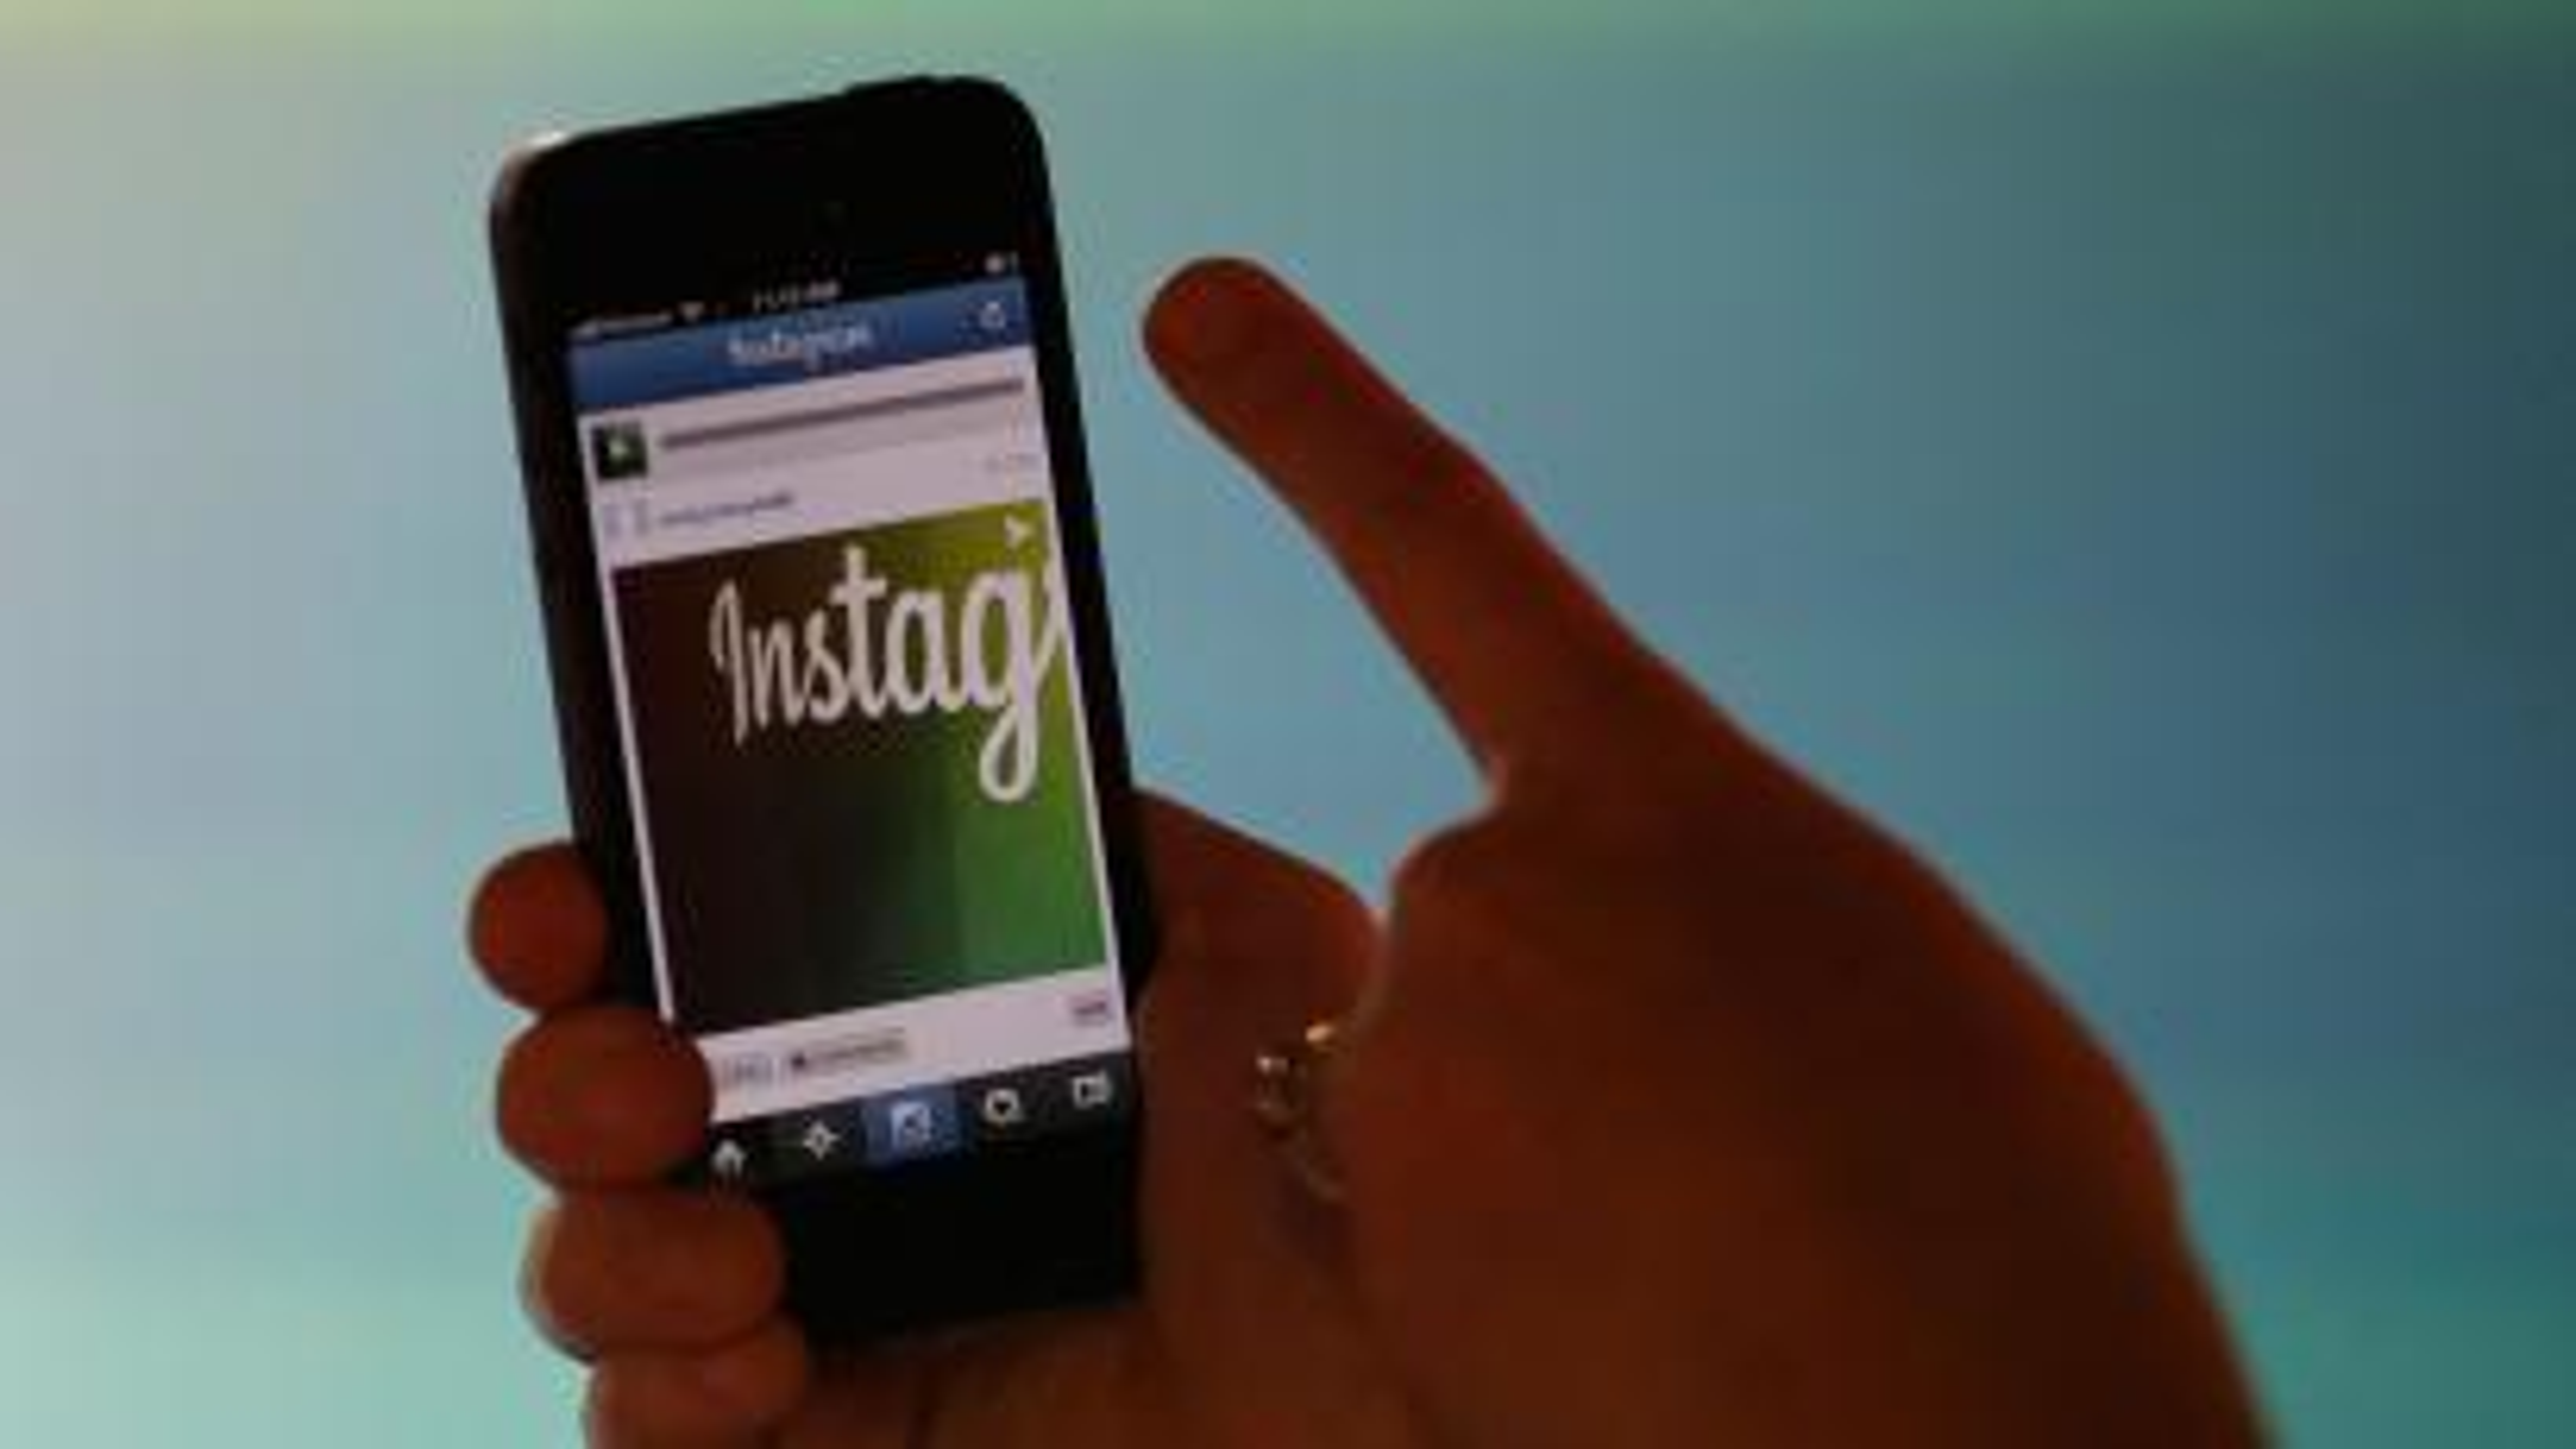 Instagram's new video feature is demonstrated at Facebook headquarters in Menlo Park, Calif., Thursday, June 20, 2013. (AP Photo/Marcio Jose Sanchez)